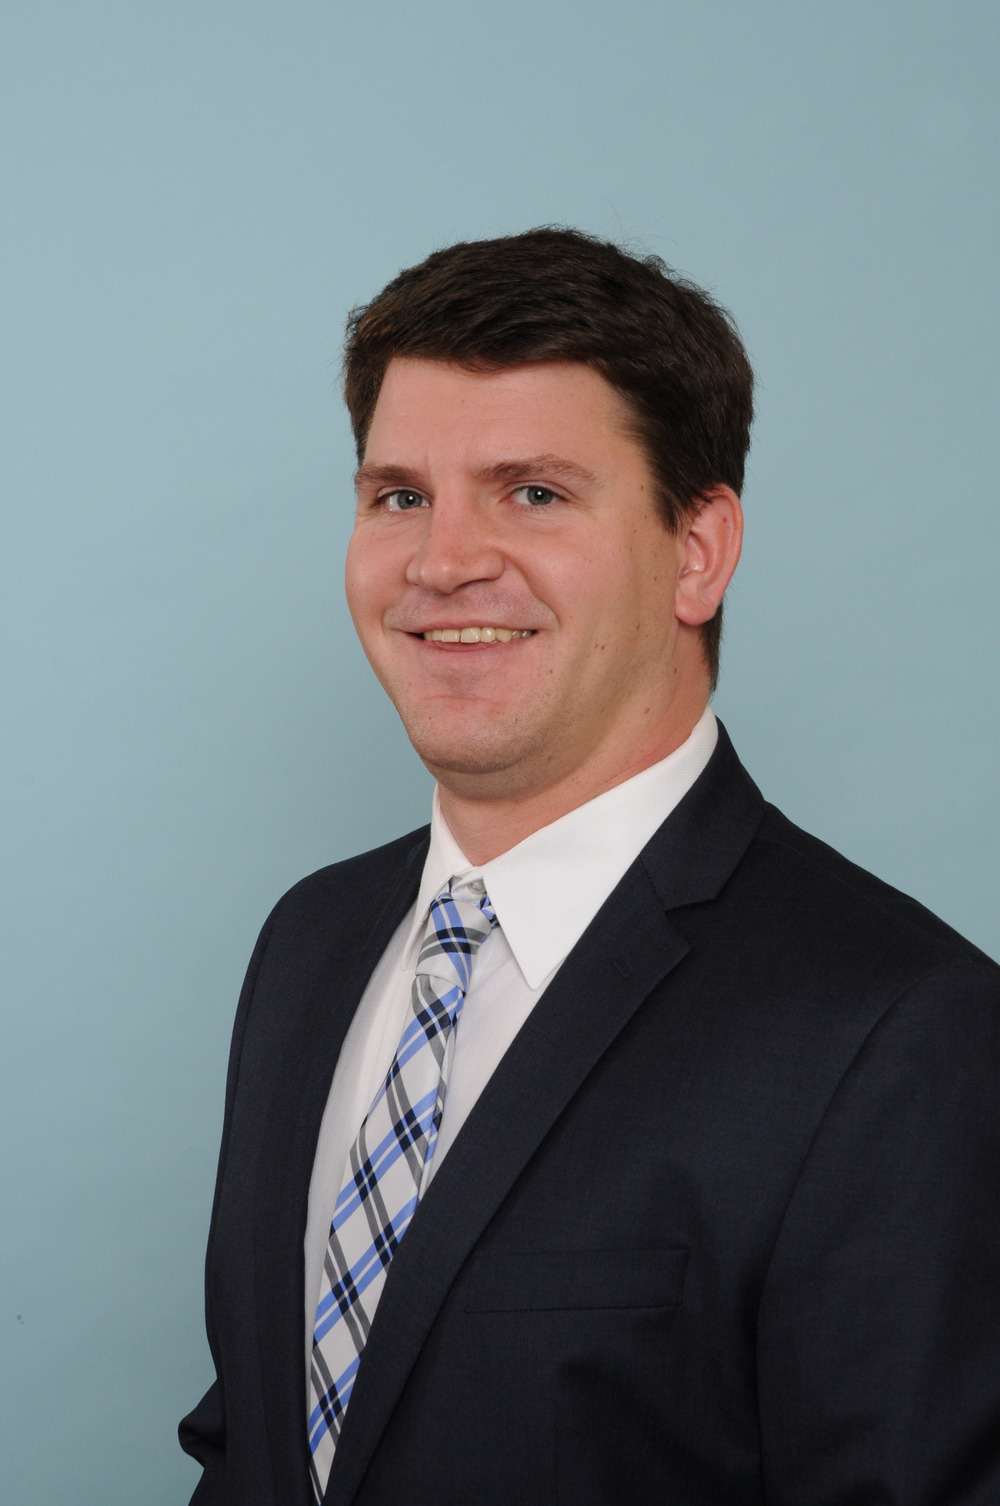 Jonathan Rodak, Director of Lacrosse Operations at Notre Dame